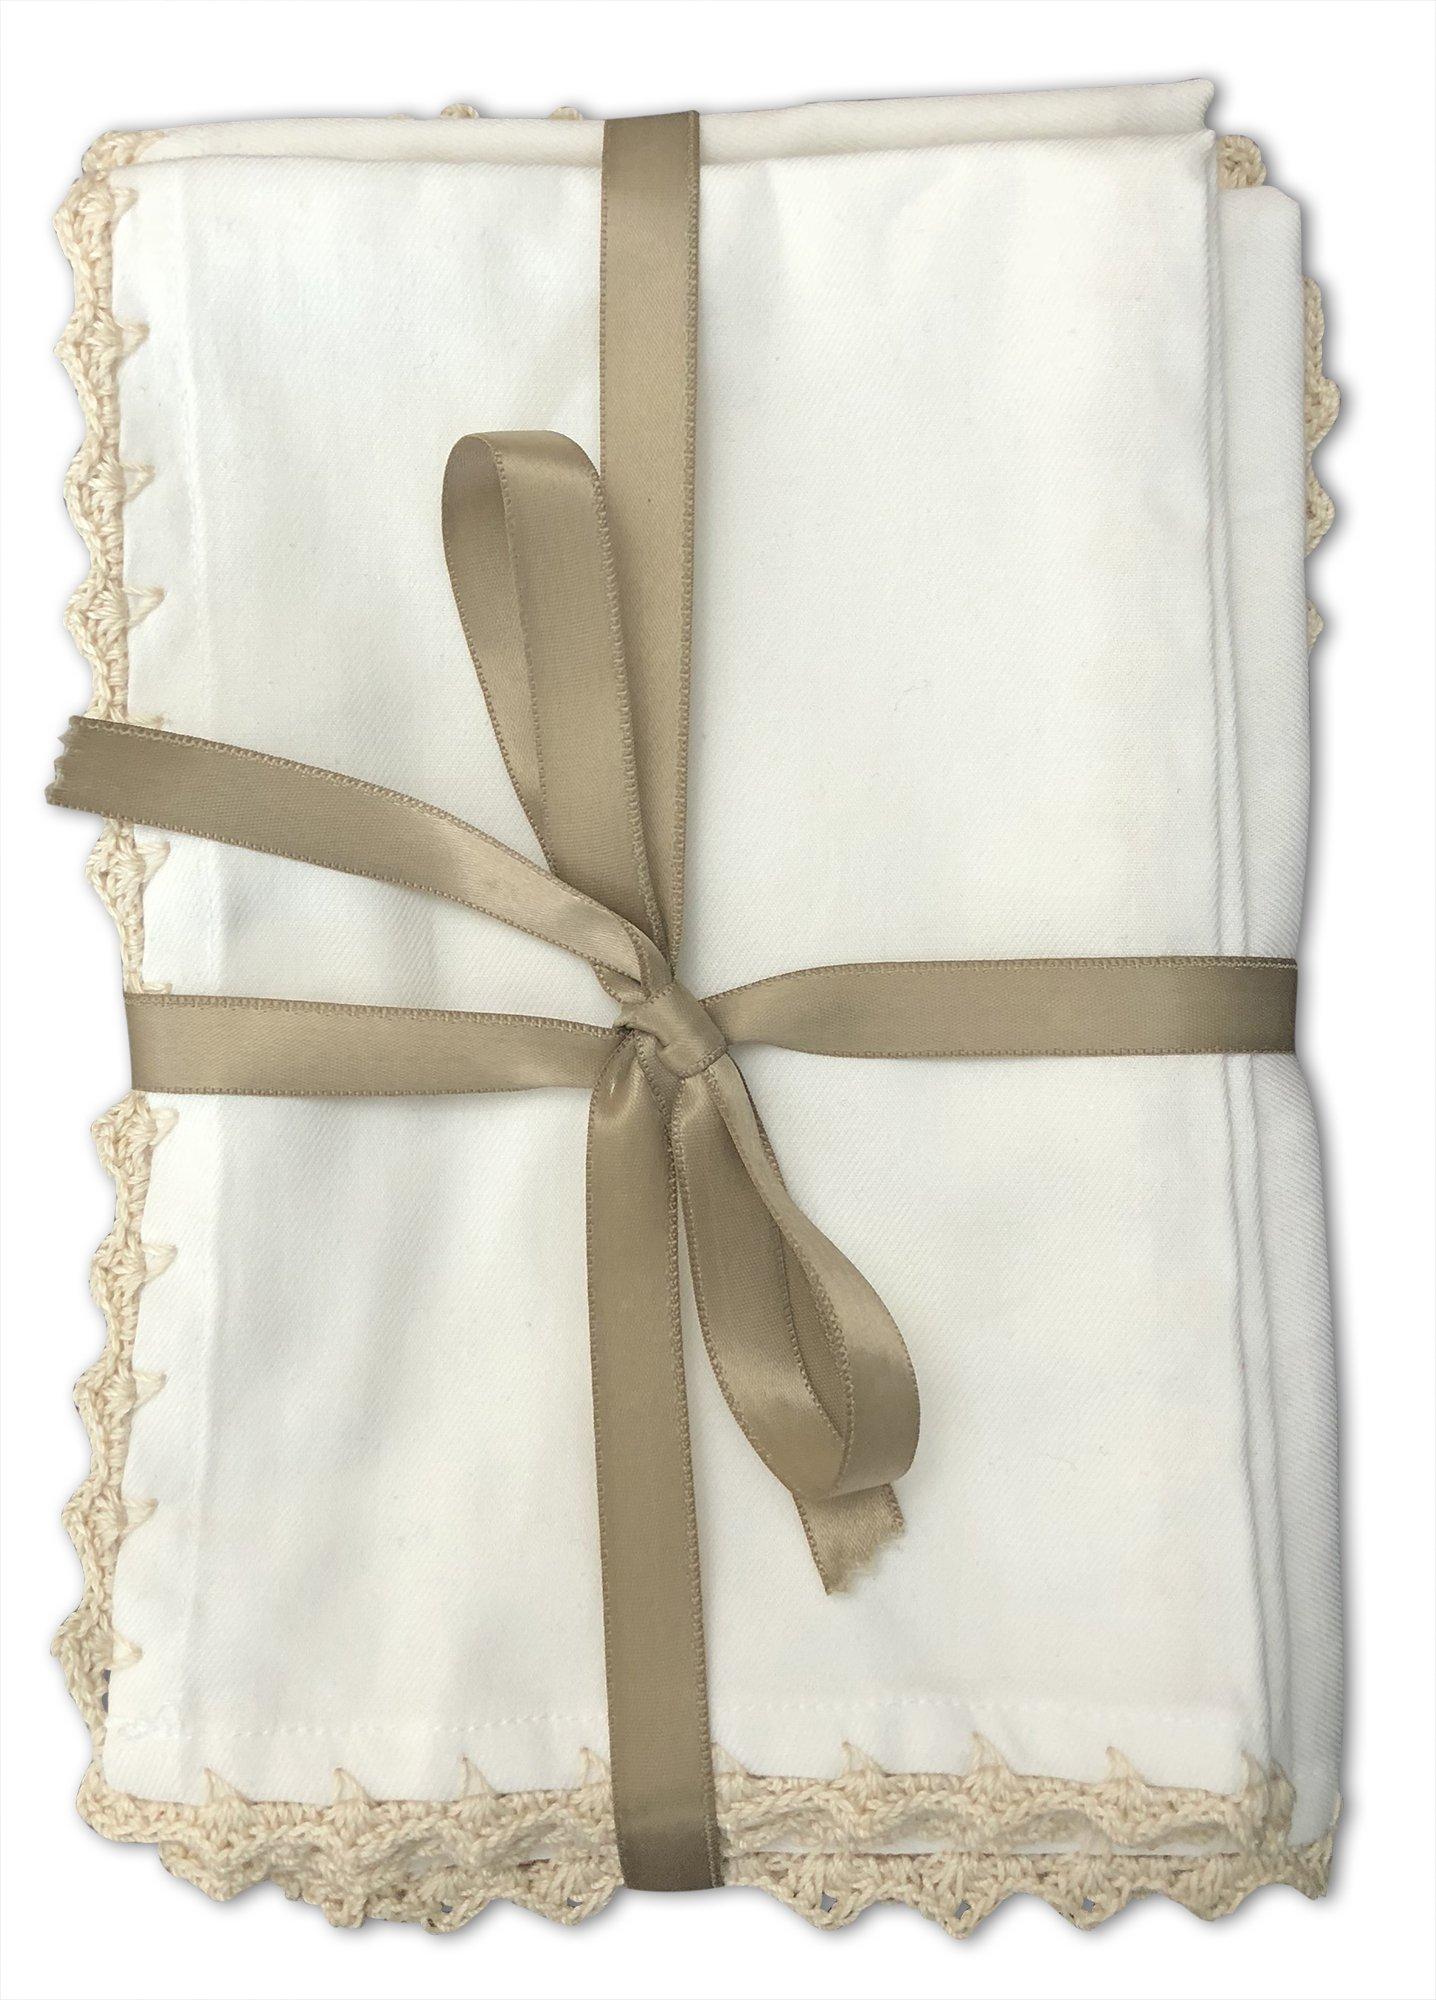 MoLi 100% Egyptian Cotton Cloth Dinner Napkins Hand Crocheted - Set of 6 Pack Lunch Linen - Elegant Decorative Fabric Handmade Table Linens - Servilletas de Tela Wedding Napkin (White) by MoLi (Image #2)